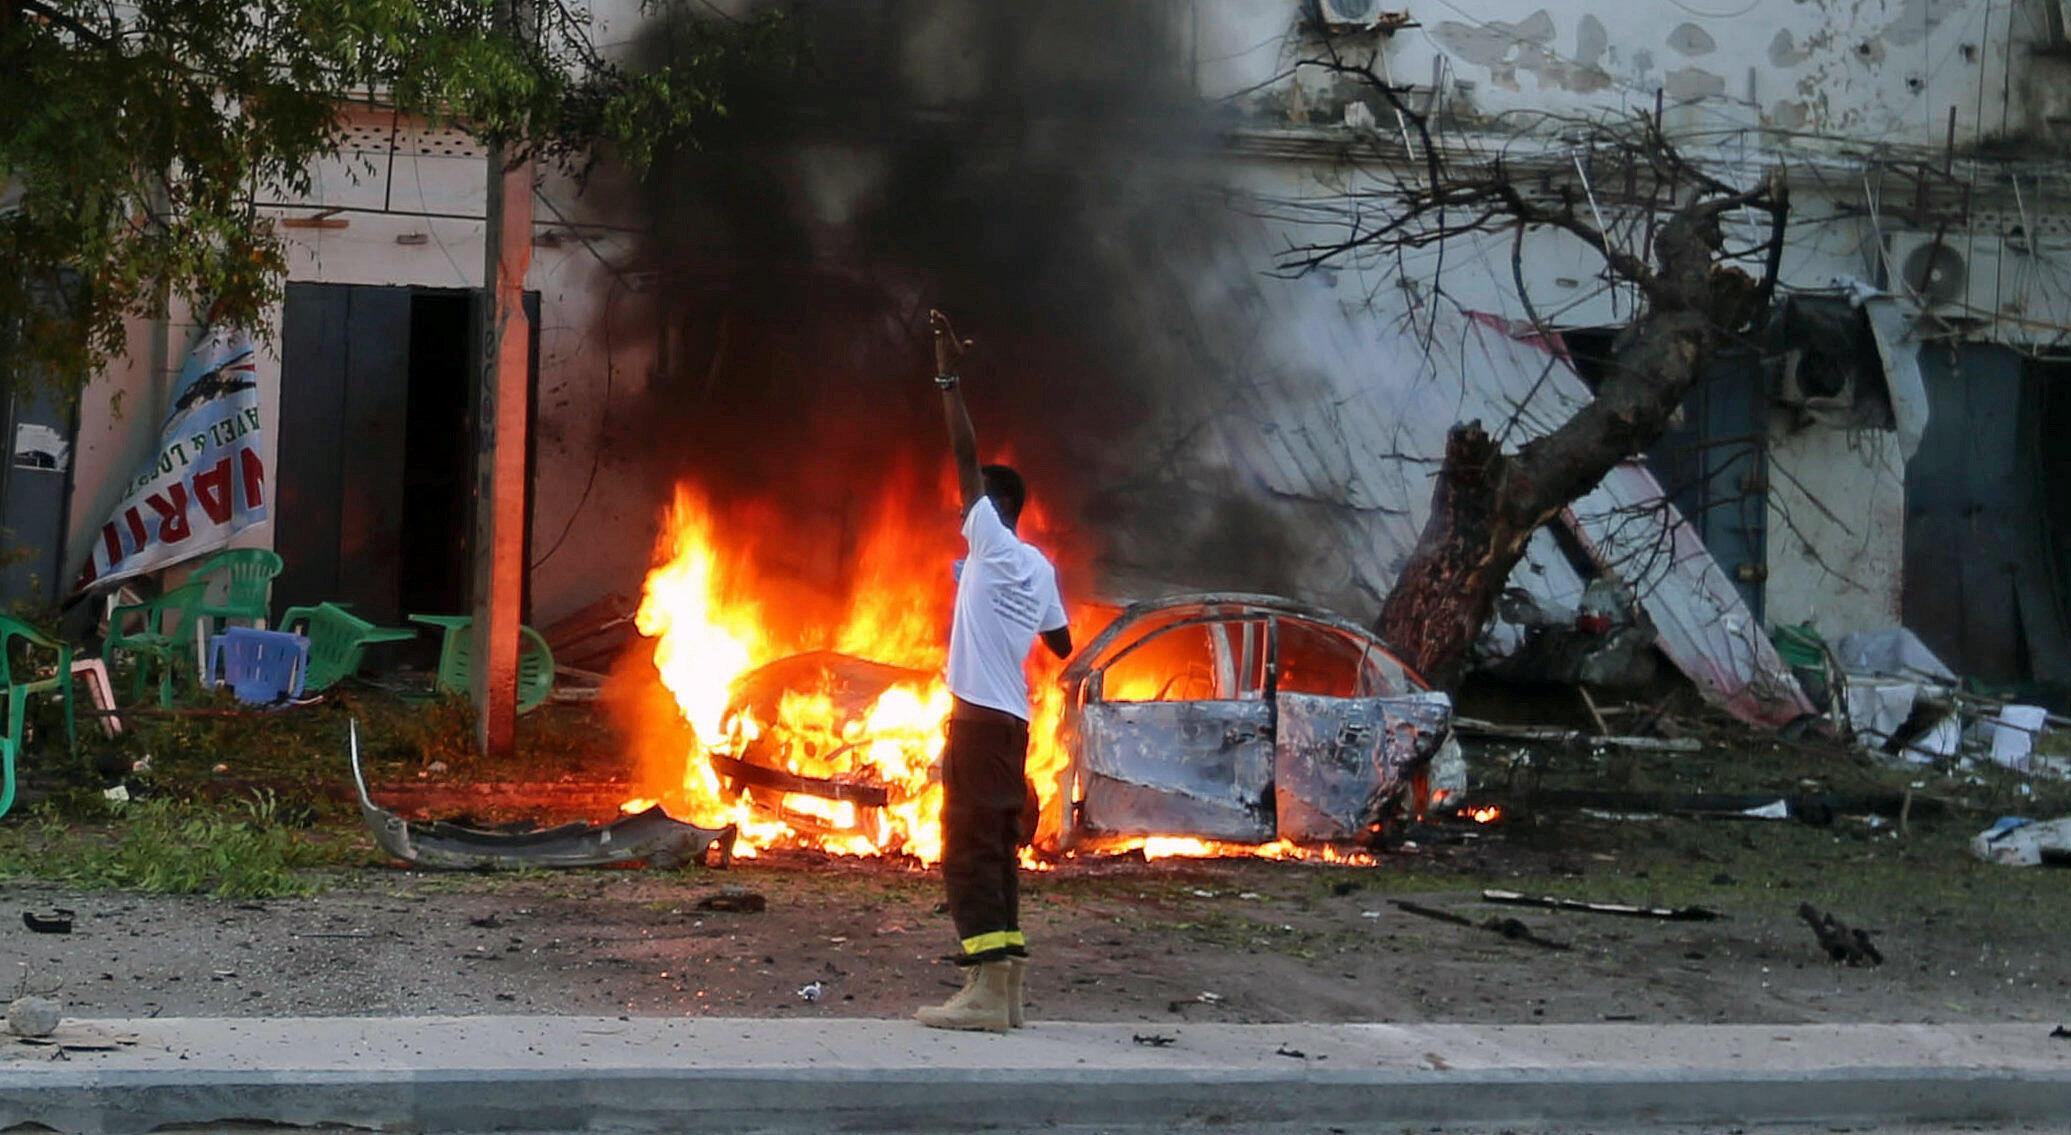 Un attentat a visé une café de Mogadiscio, Somalie, le 8 mai 2017.